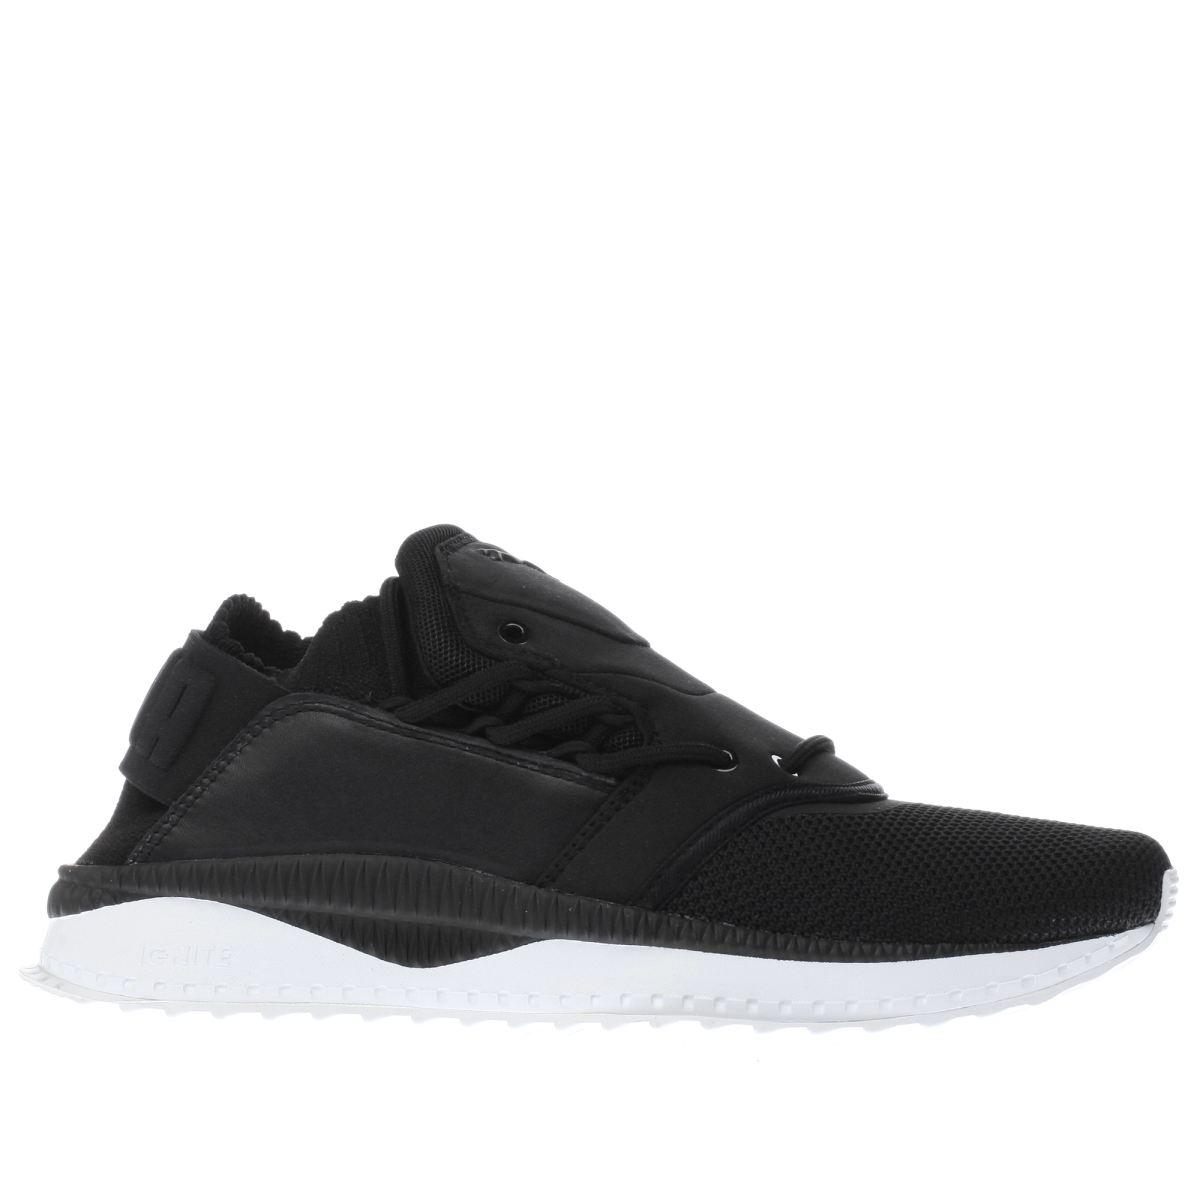 puma black tsugi shinsei trainers